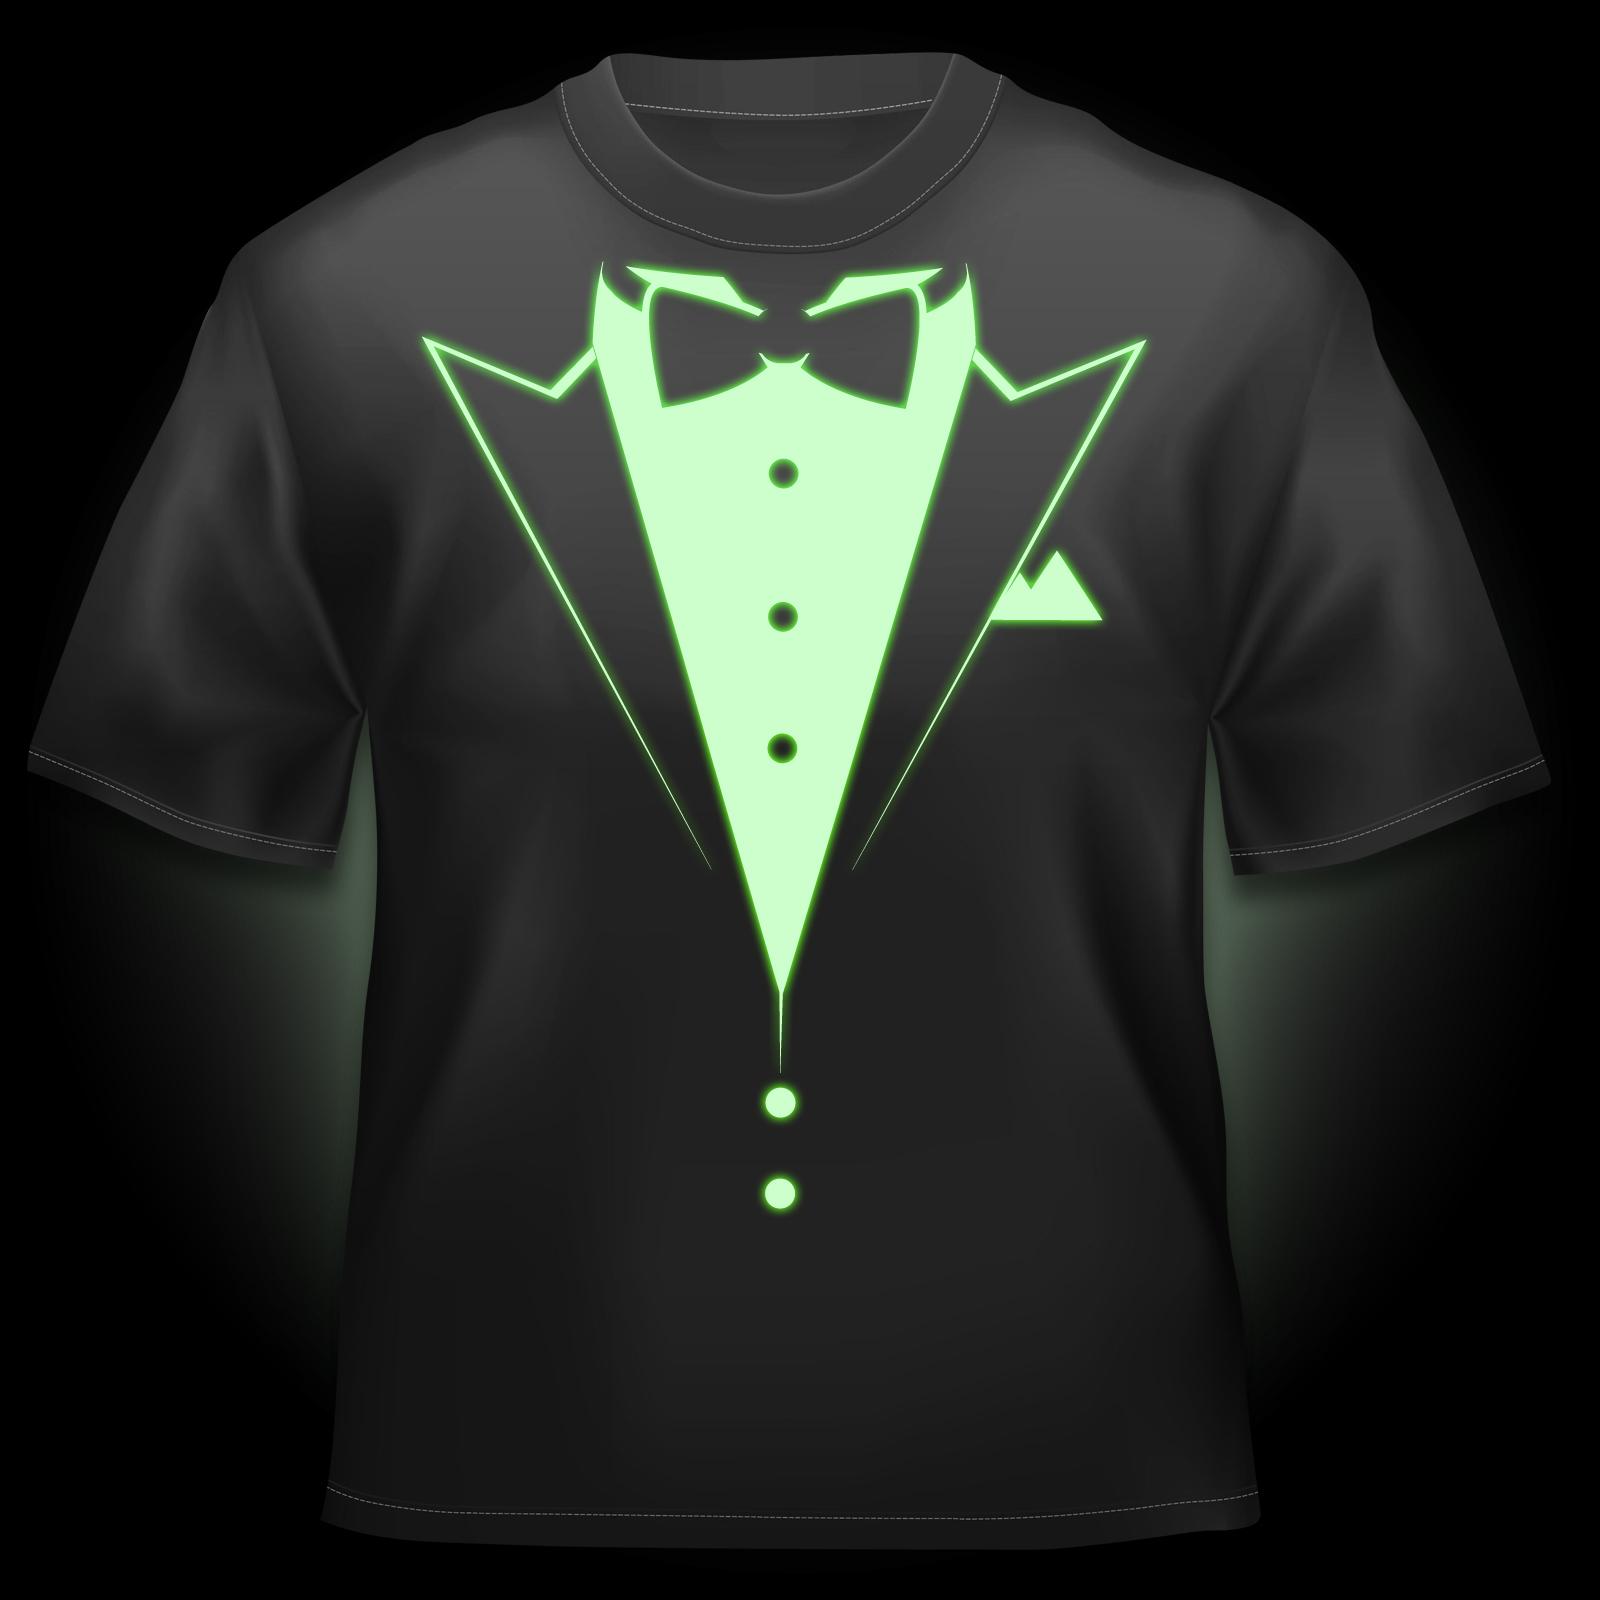 Glow T Shirt Dinner Jacket